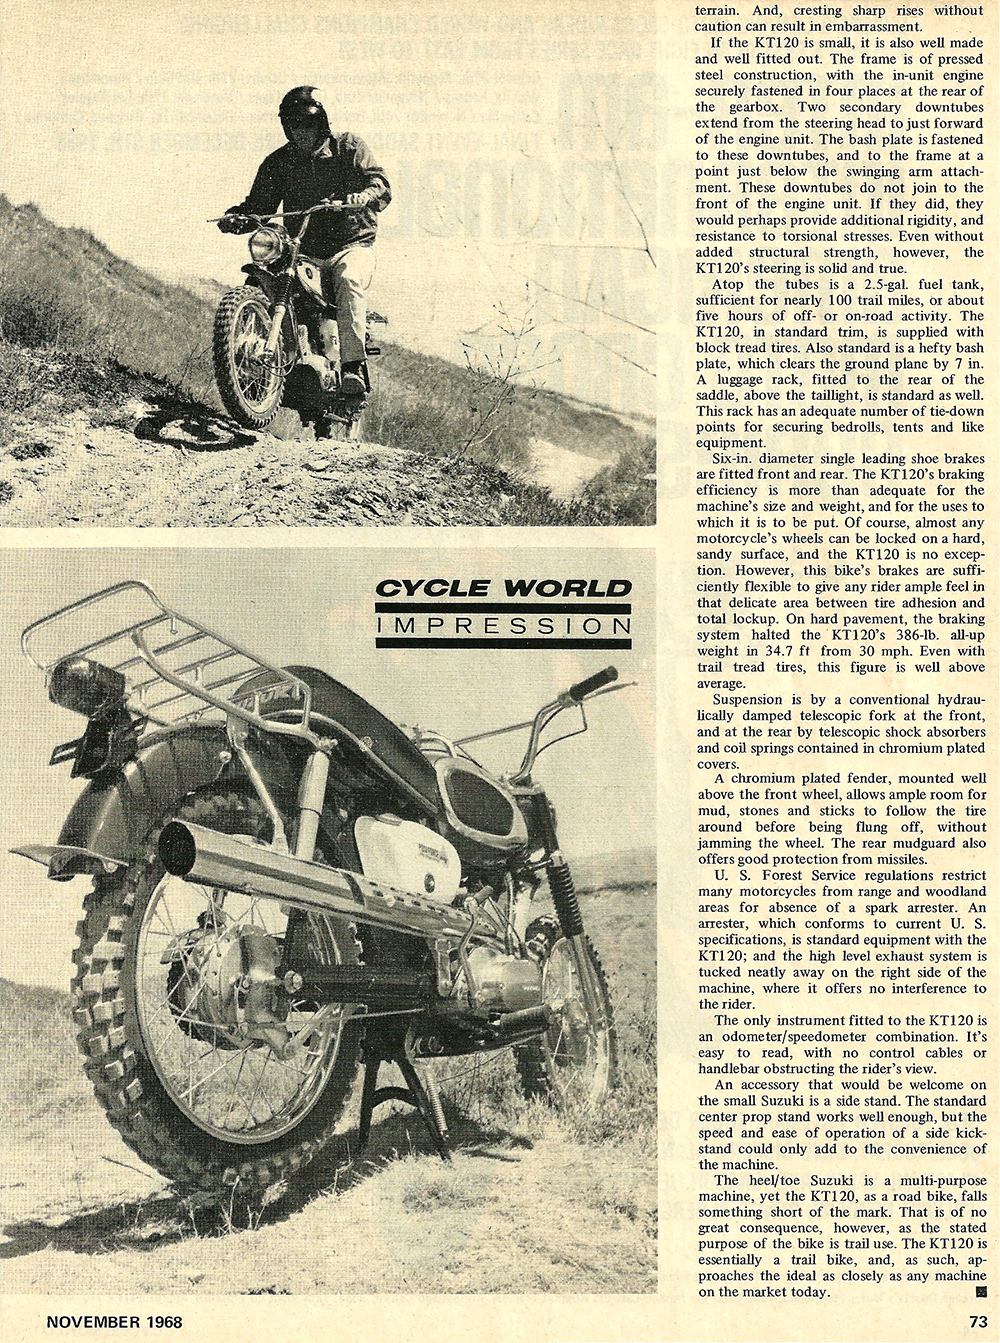 1968 Suzuki KT 120 Trail bike road test 02.jpg